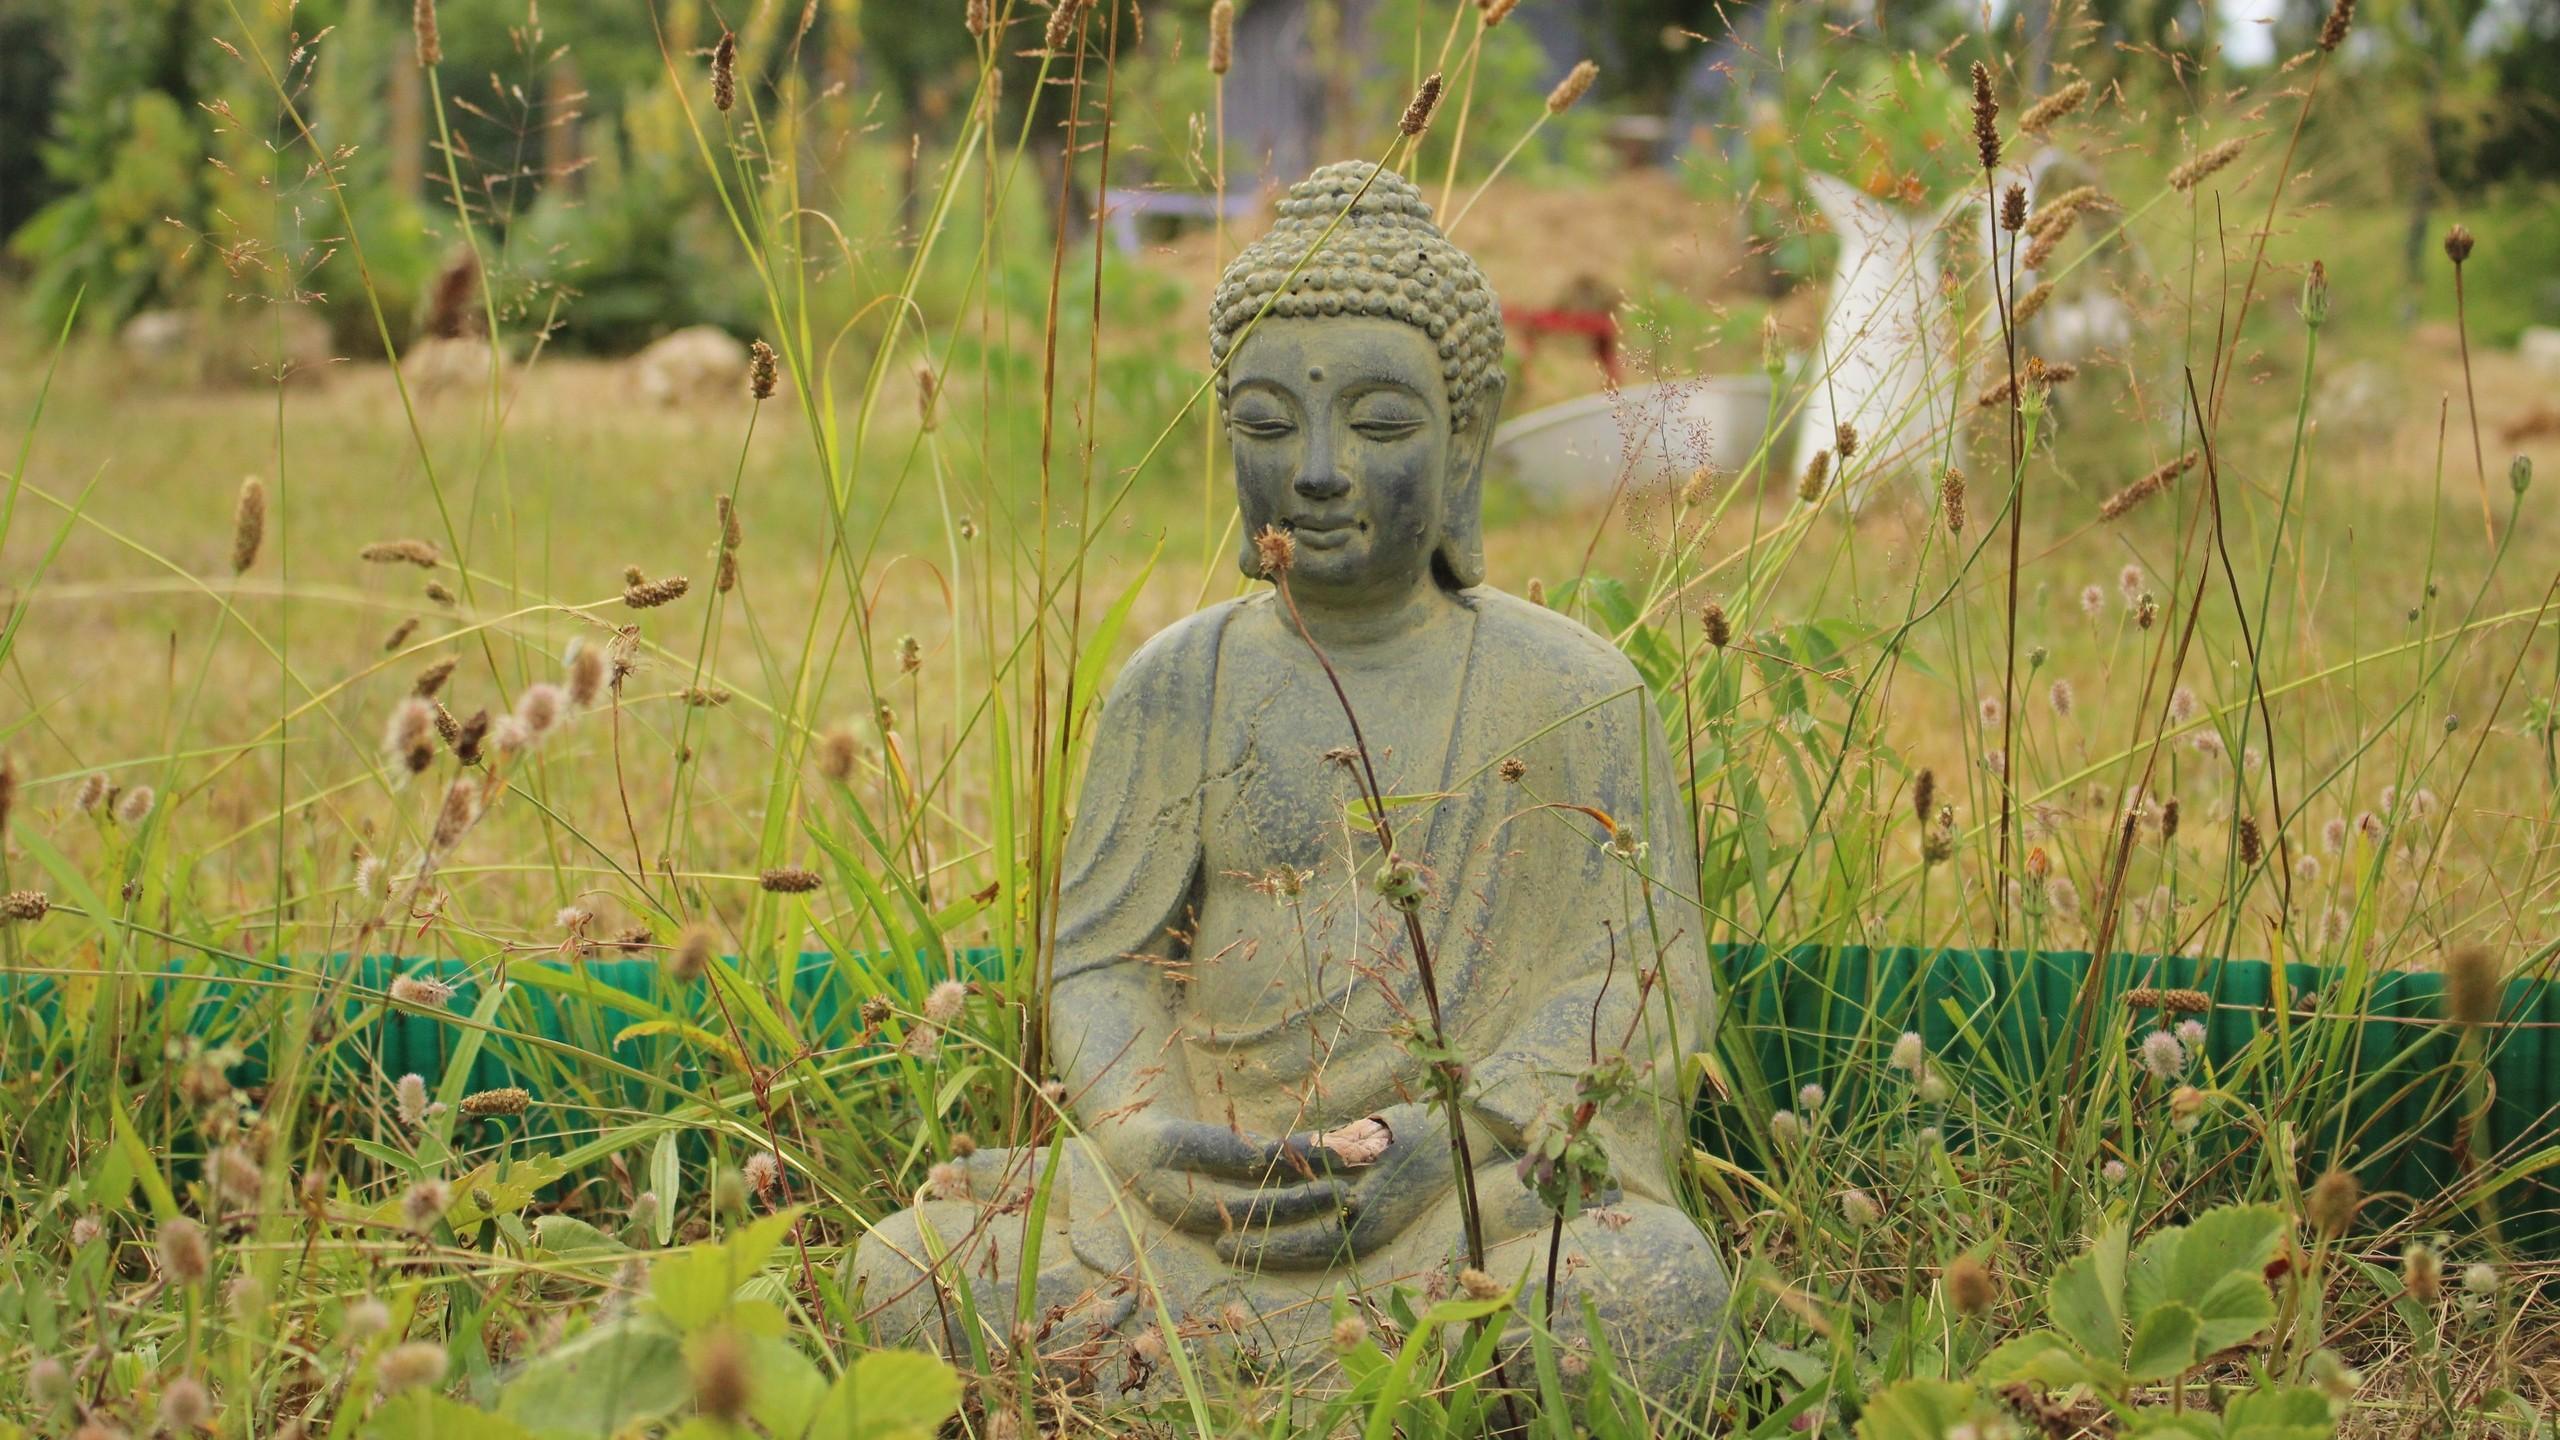 Res: 2560x1440,  Wallpaper buddha, buddhism, meditation, grass